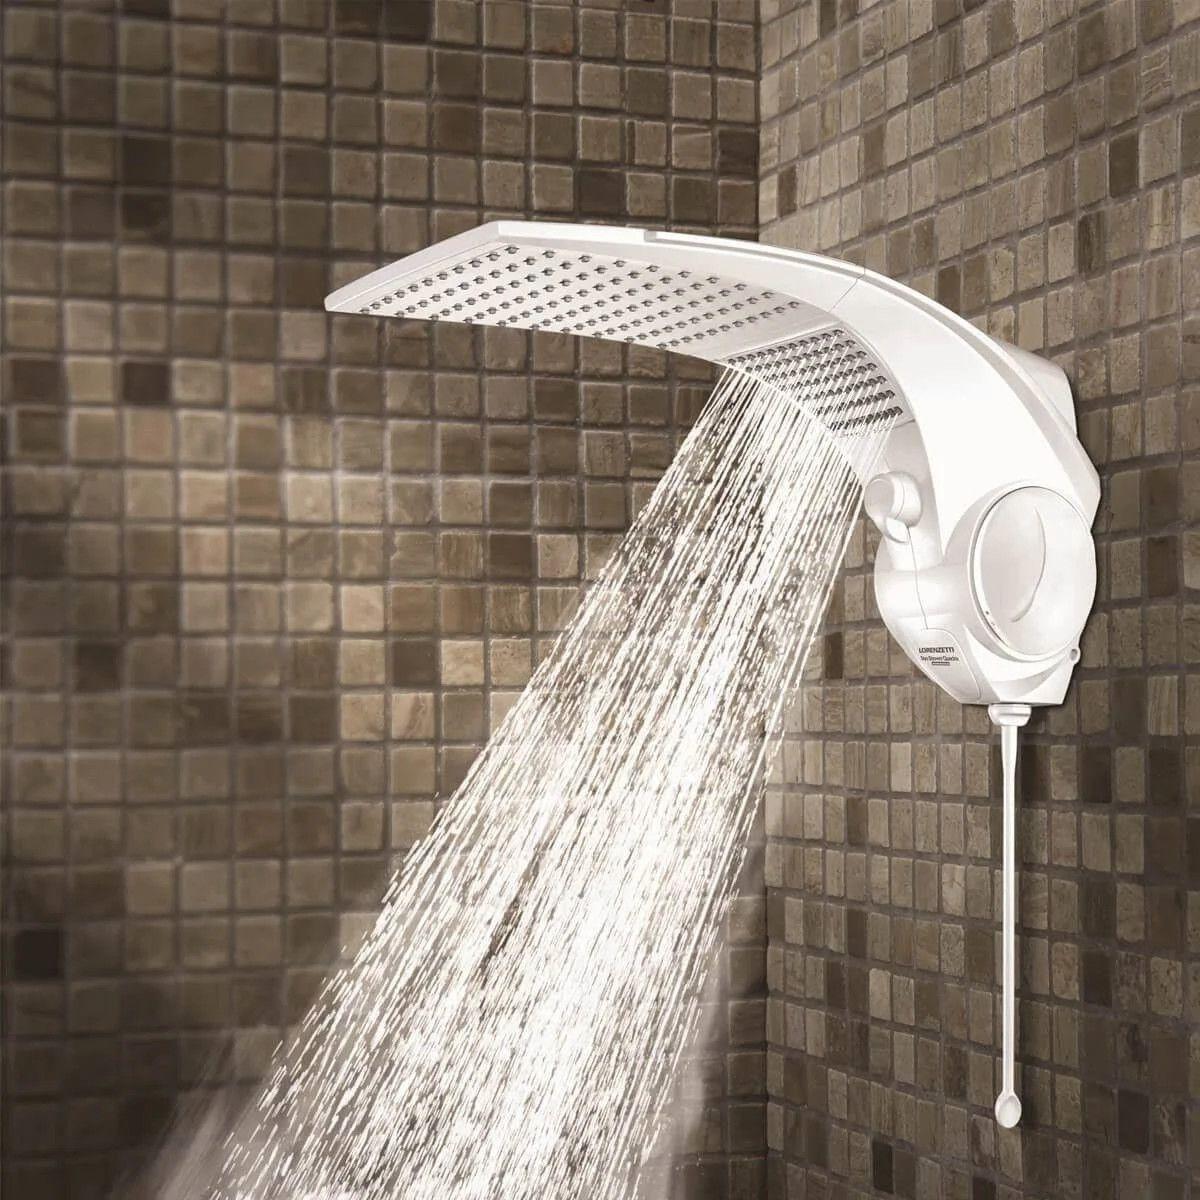 Chuveiro Duo Shower Quadra Multitemperaturas Lorenzetti